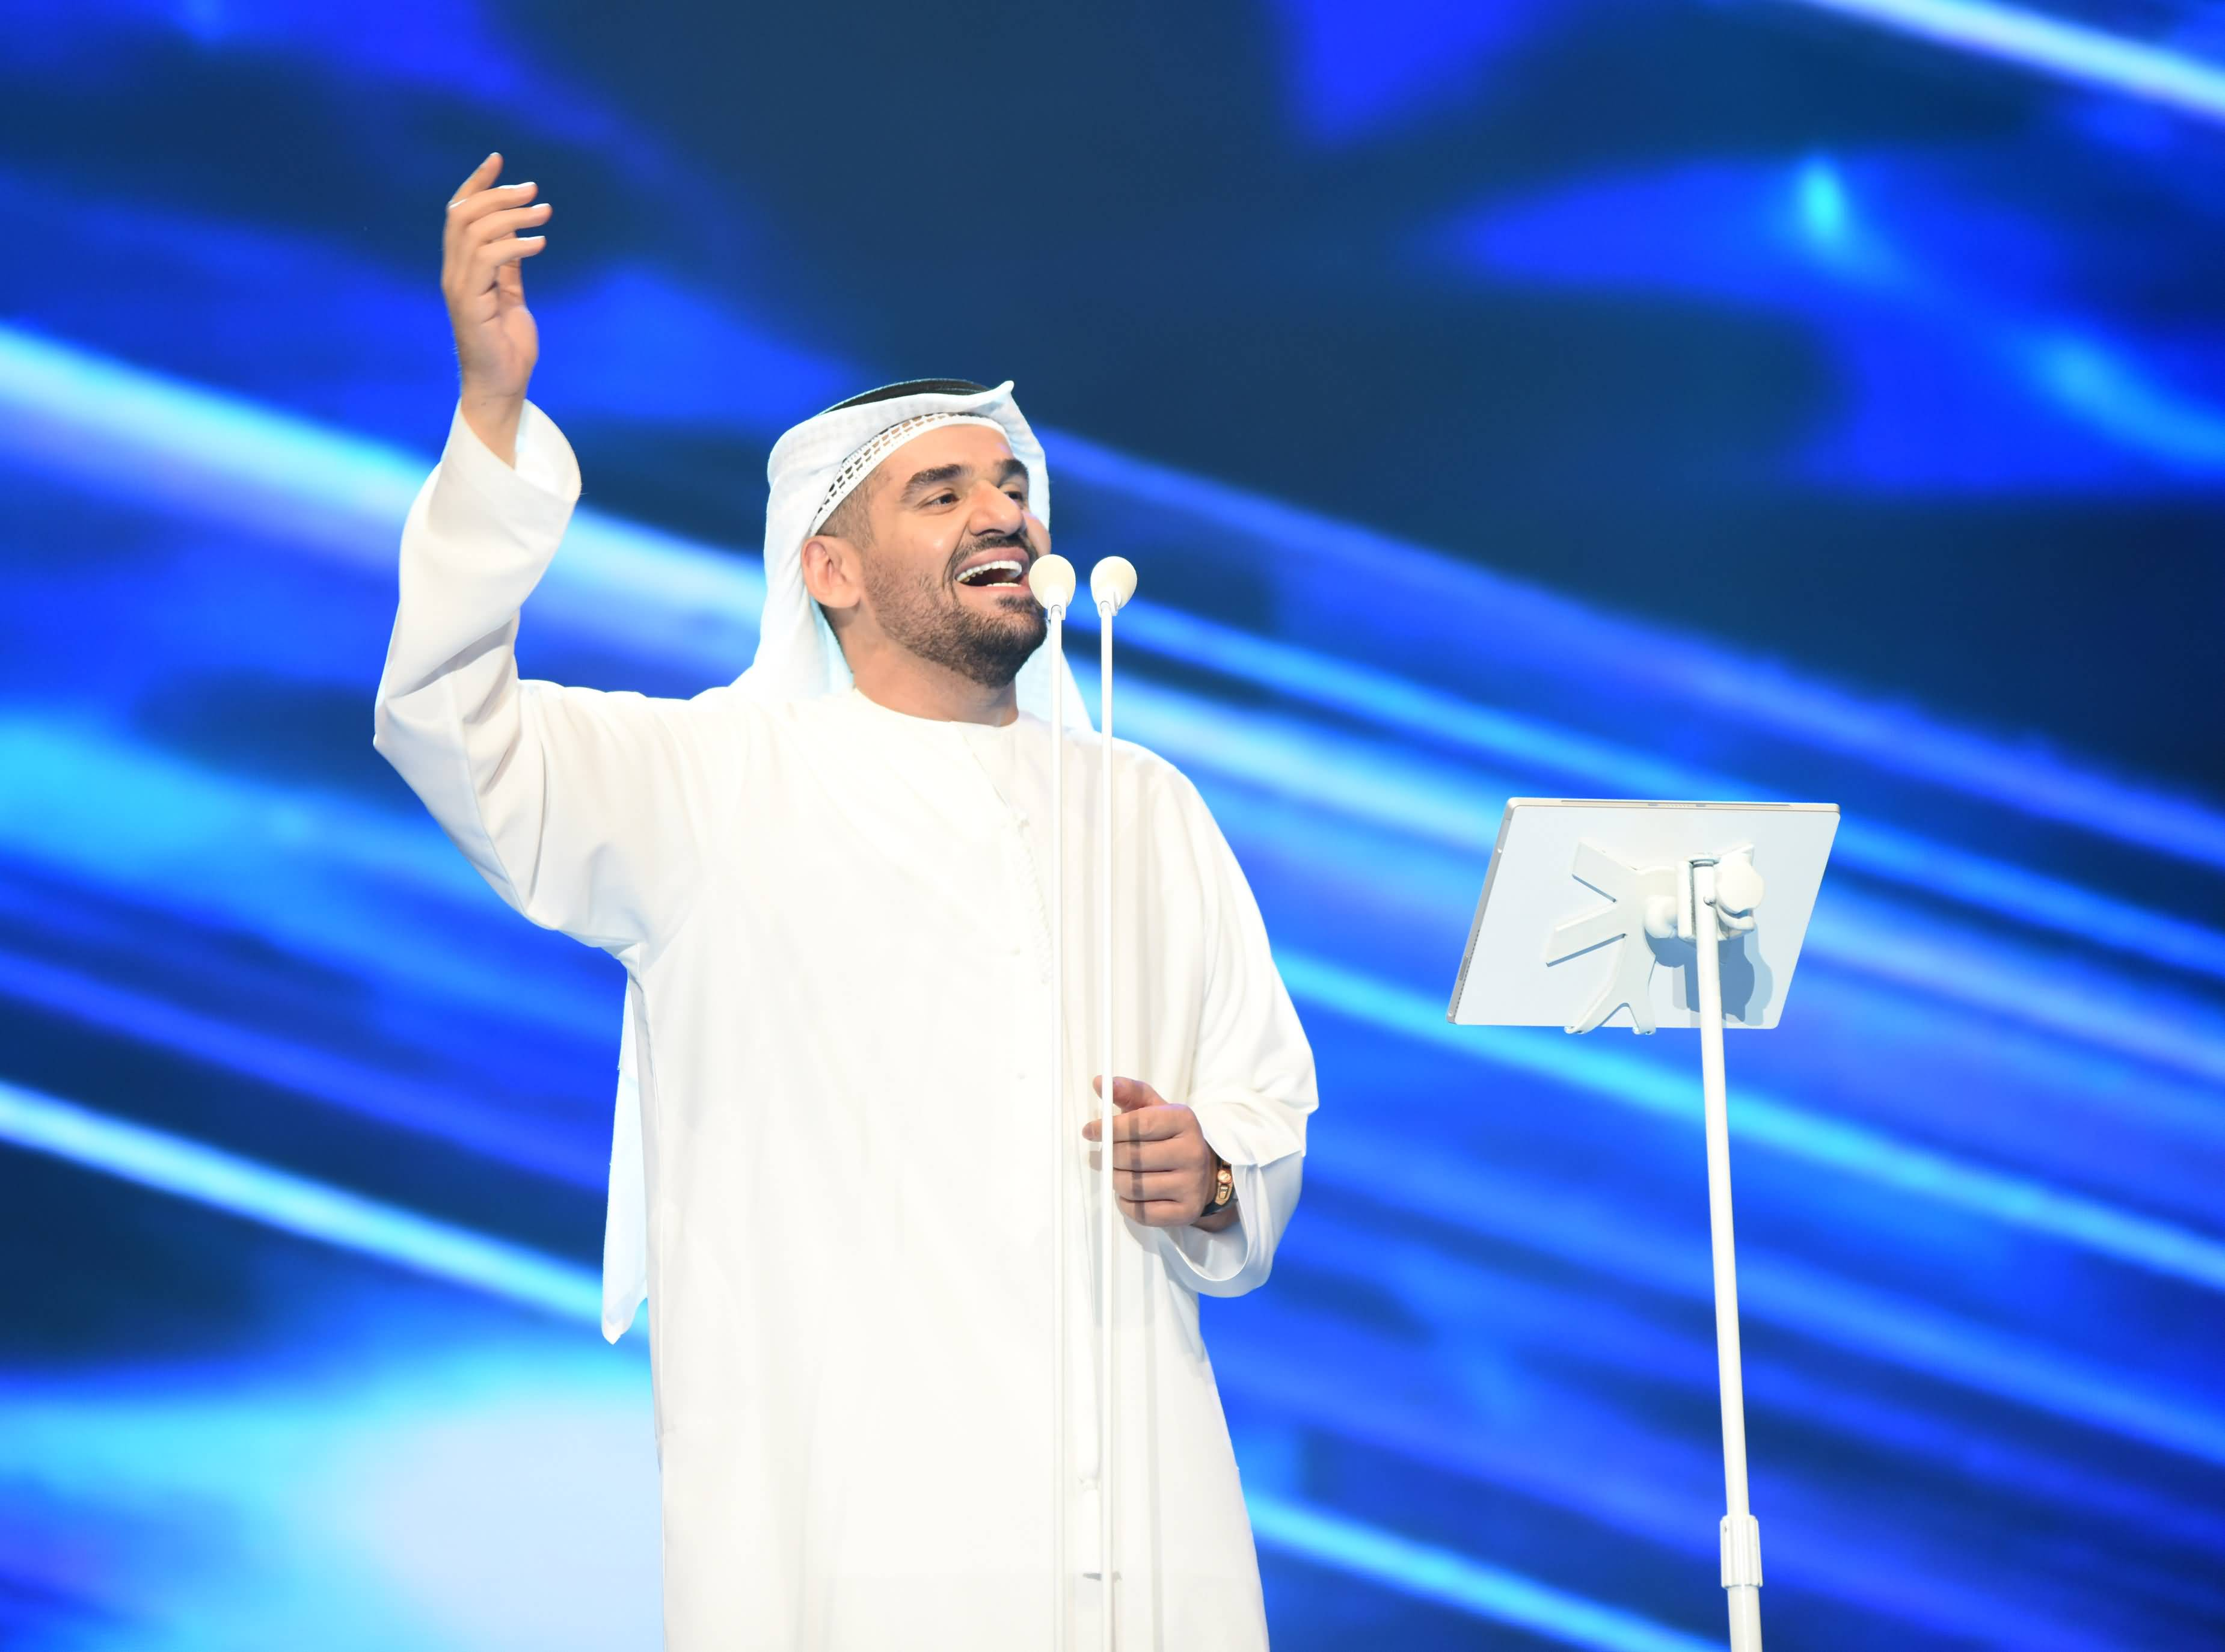 Photo of إكسبو 2020 دبي تختار الفنان الإماراتي حسين الجسمي سفيراً لها